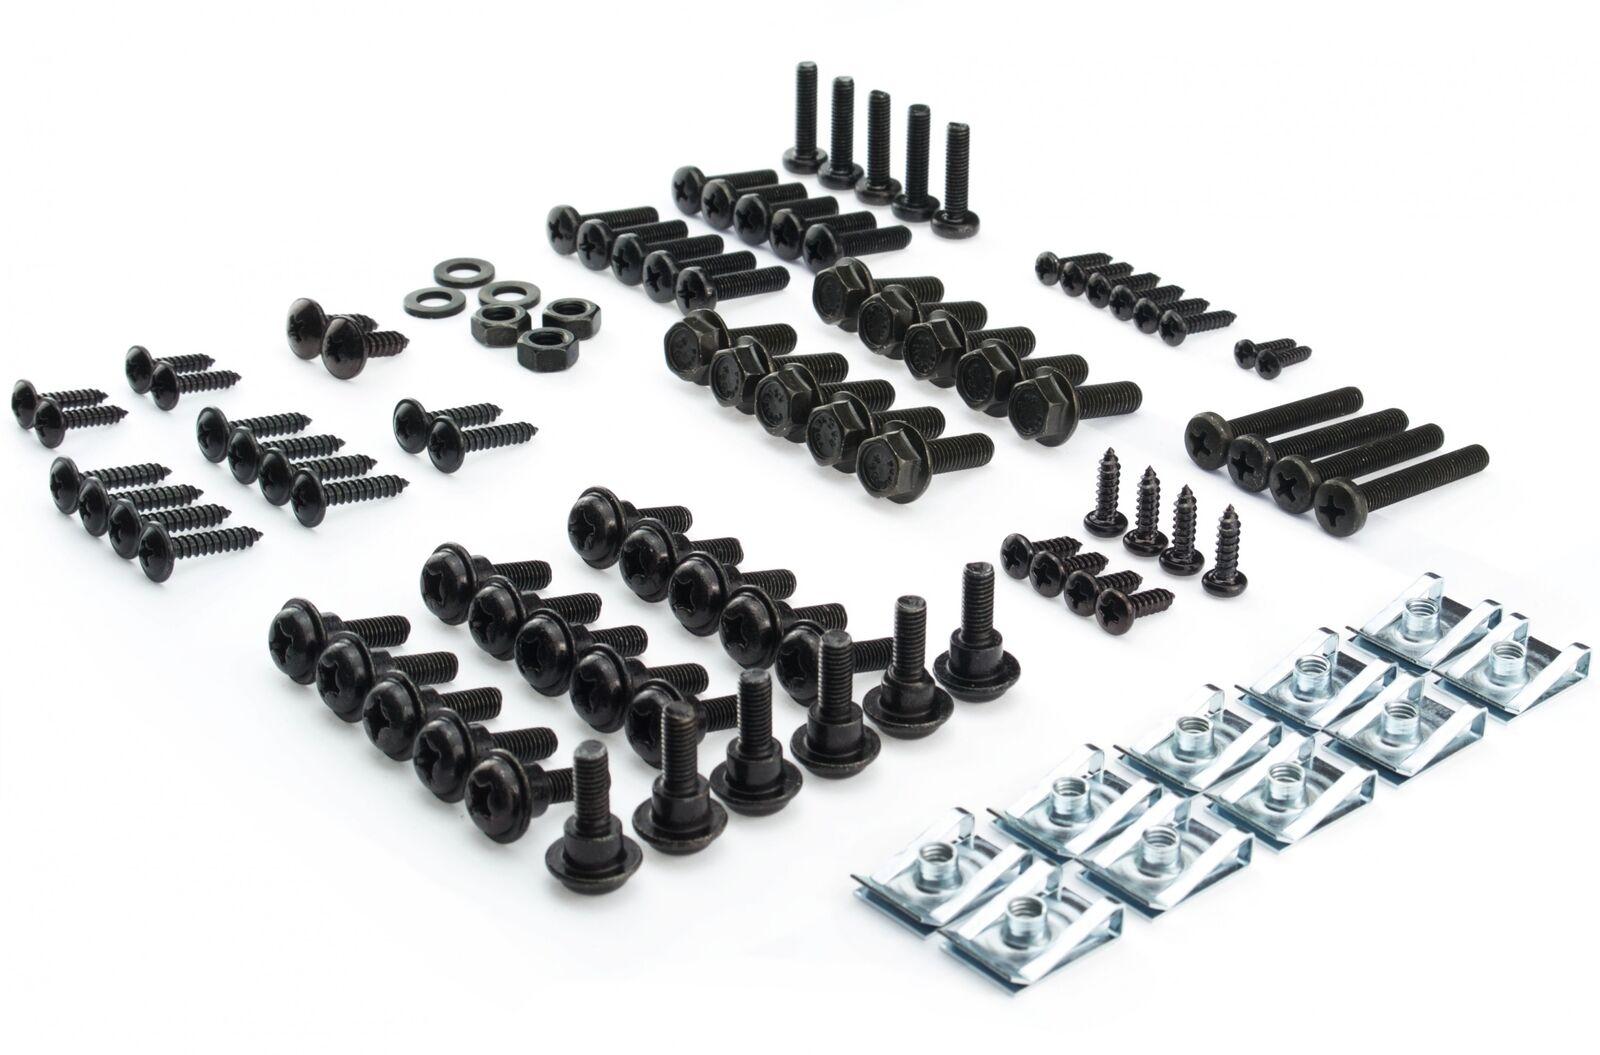 Verkleidungschrauben Peugeot Vivacity 3 Schrauben Set Klemmen Vario Edelstahl A2